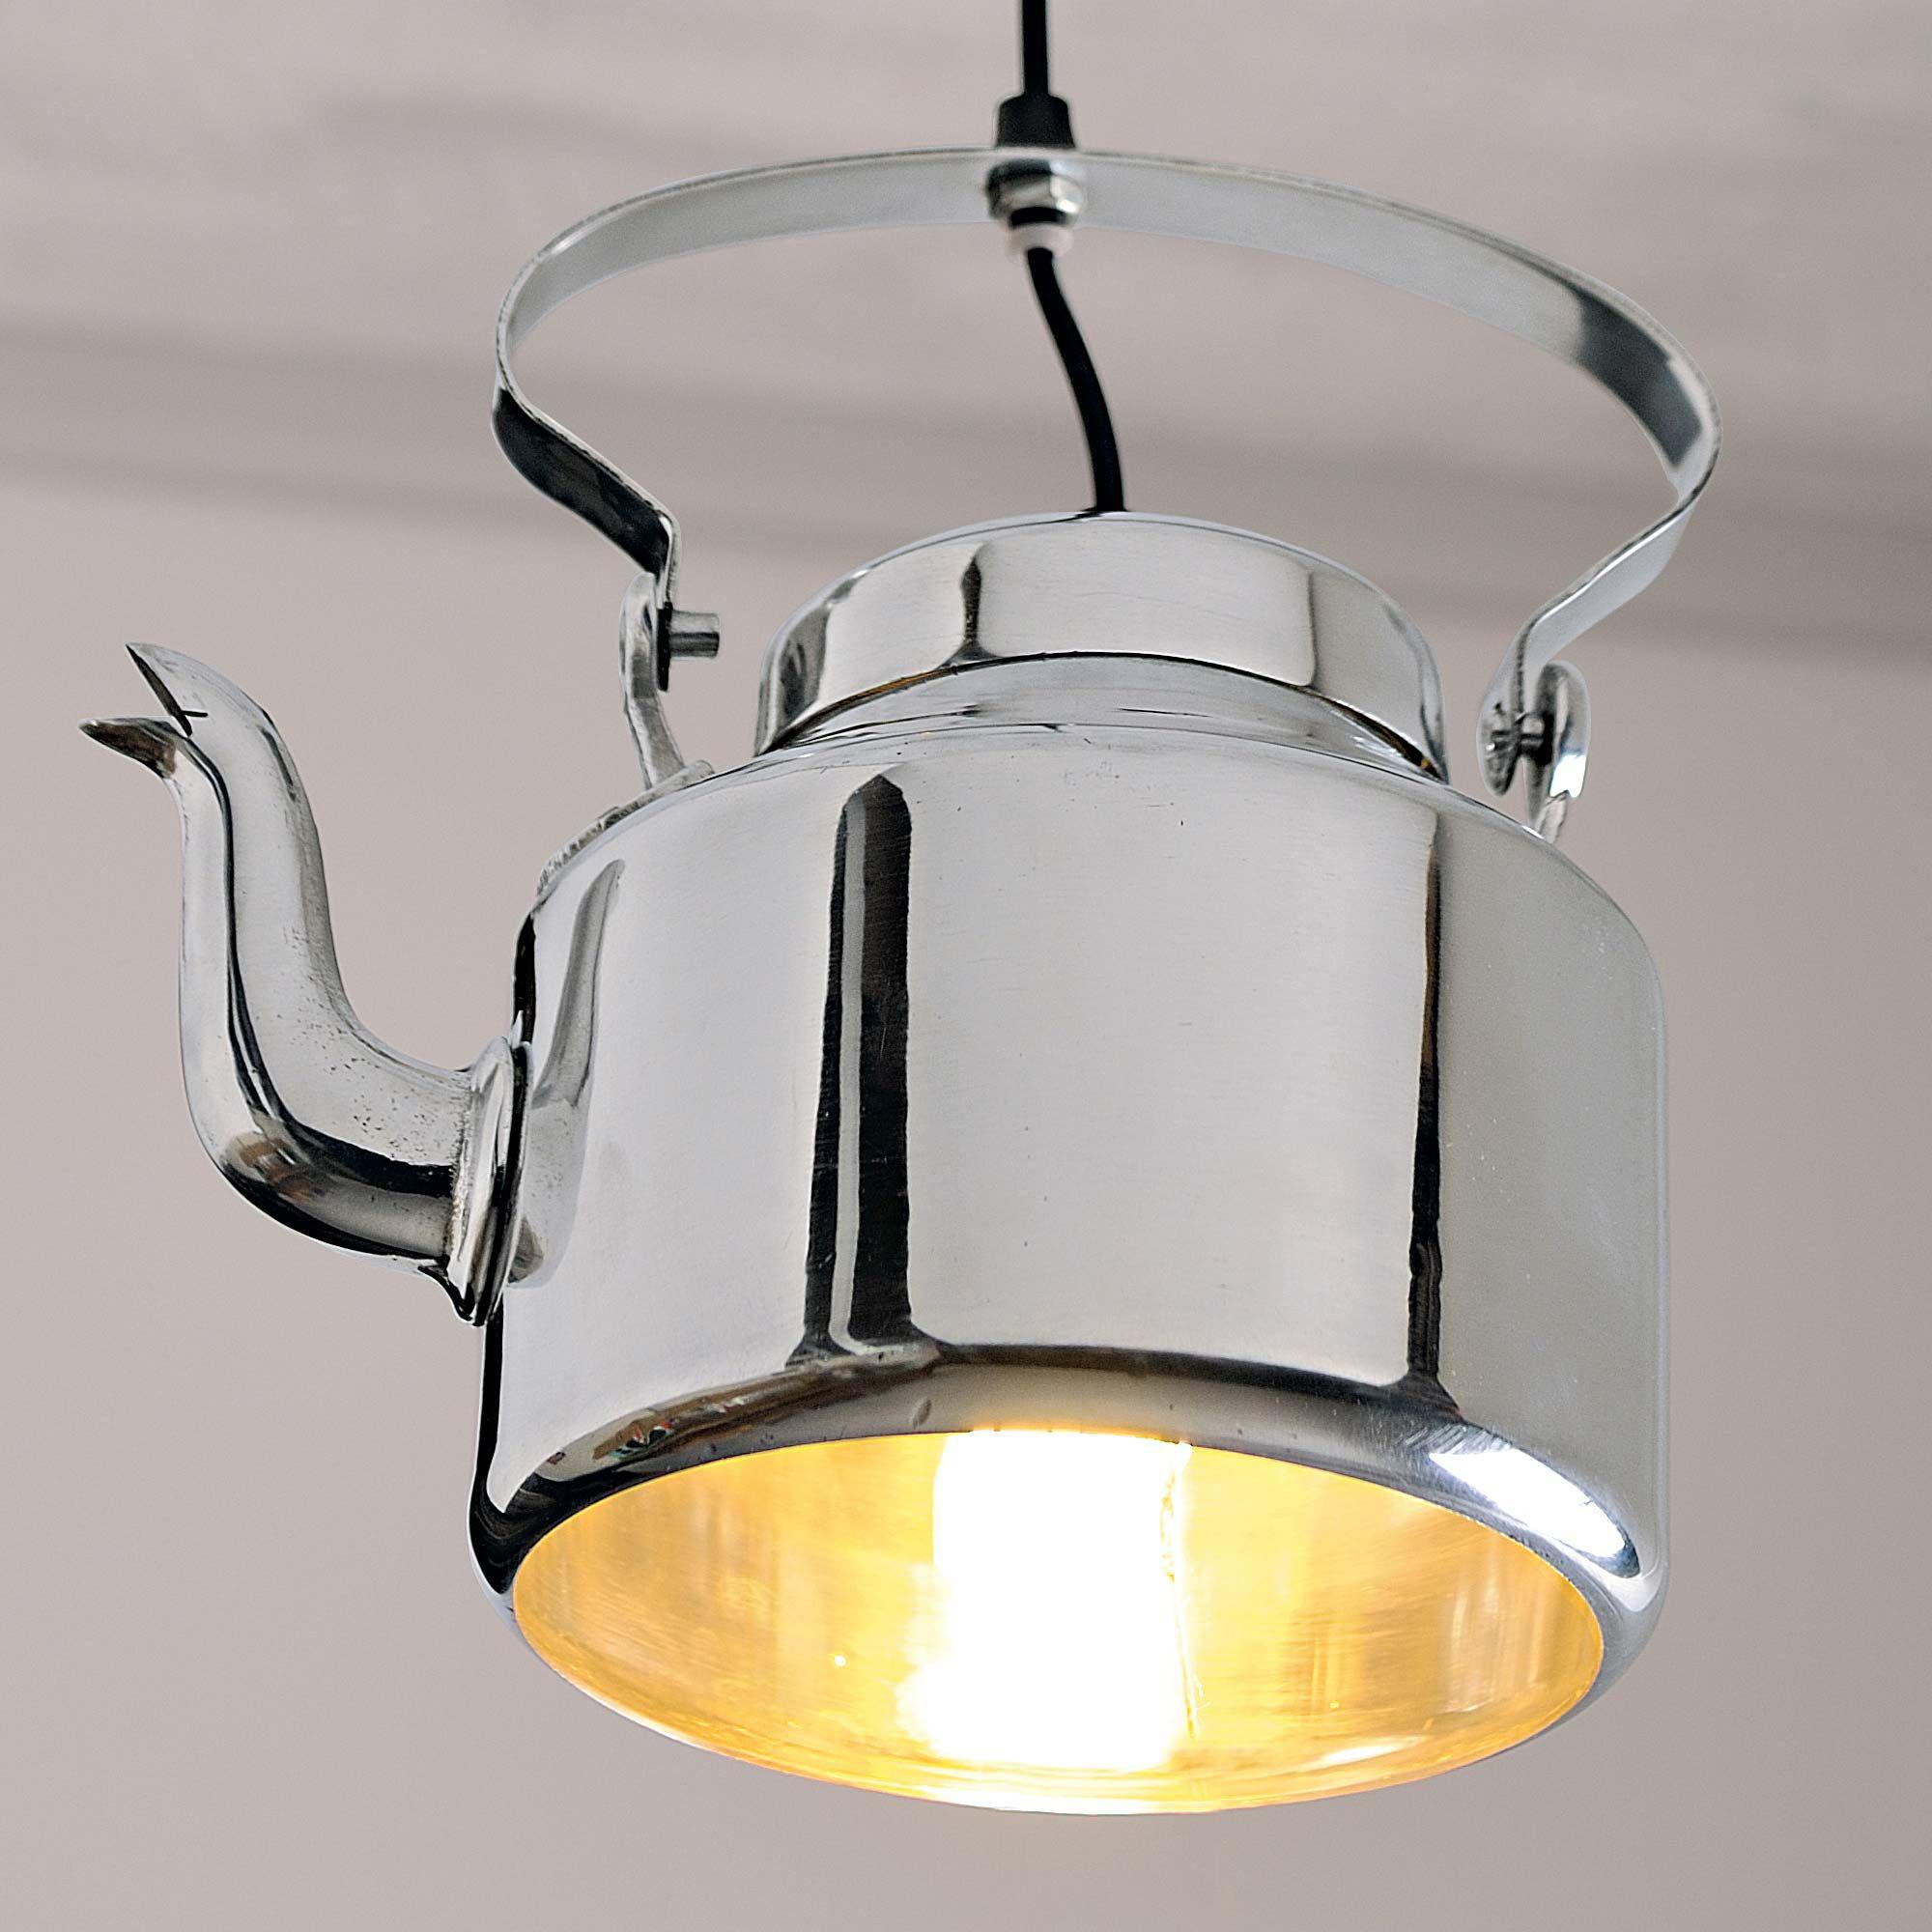 deckenlampe wasserkessel gingar moebel leuchte. Black Bedroom Furniture Sets. Home Design Ideas